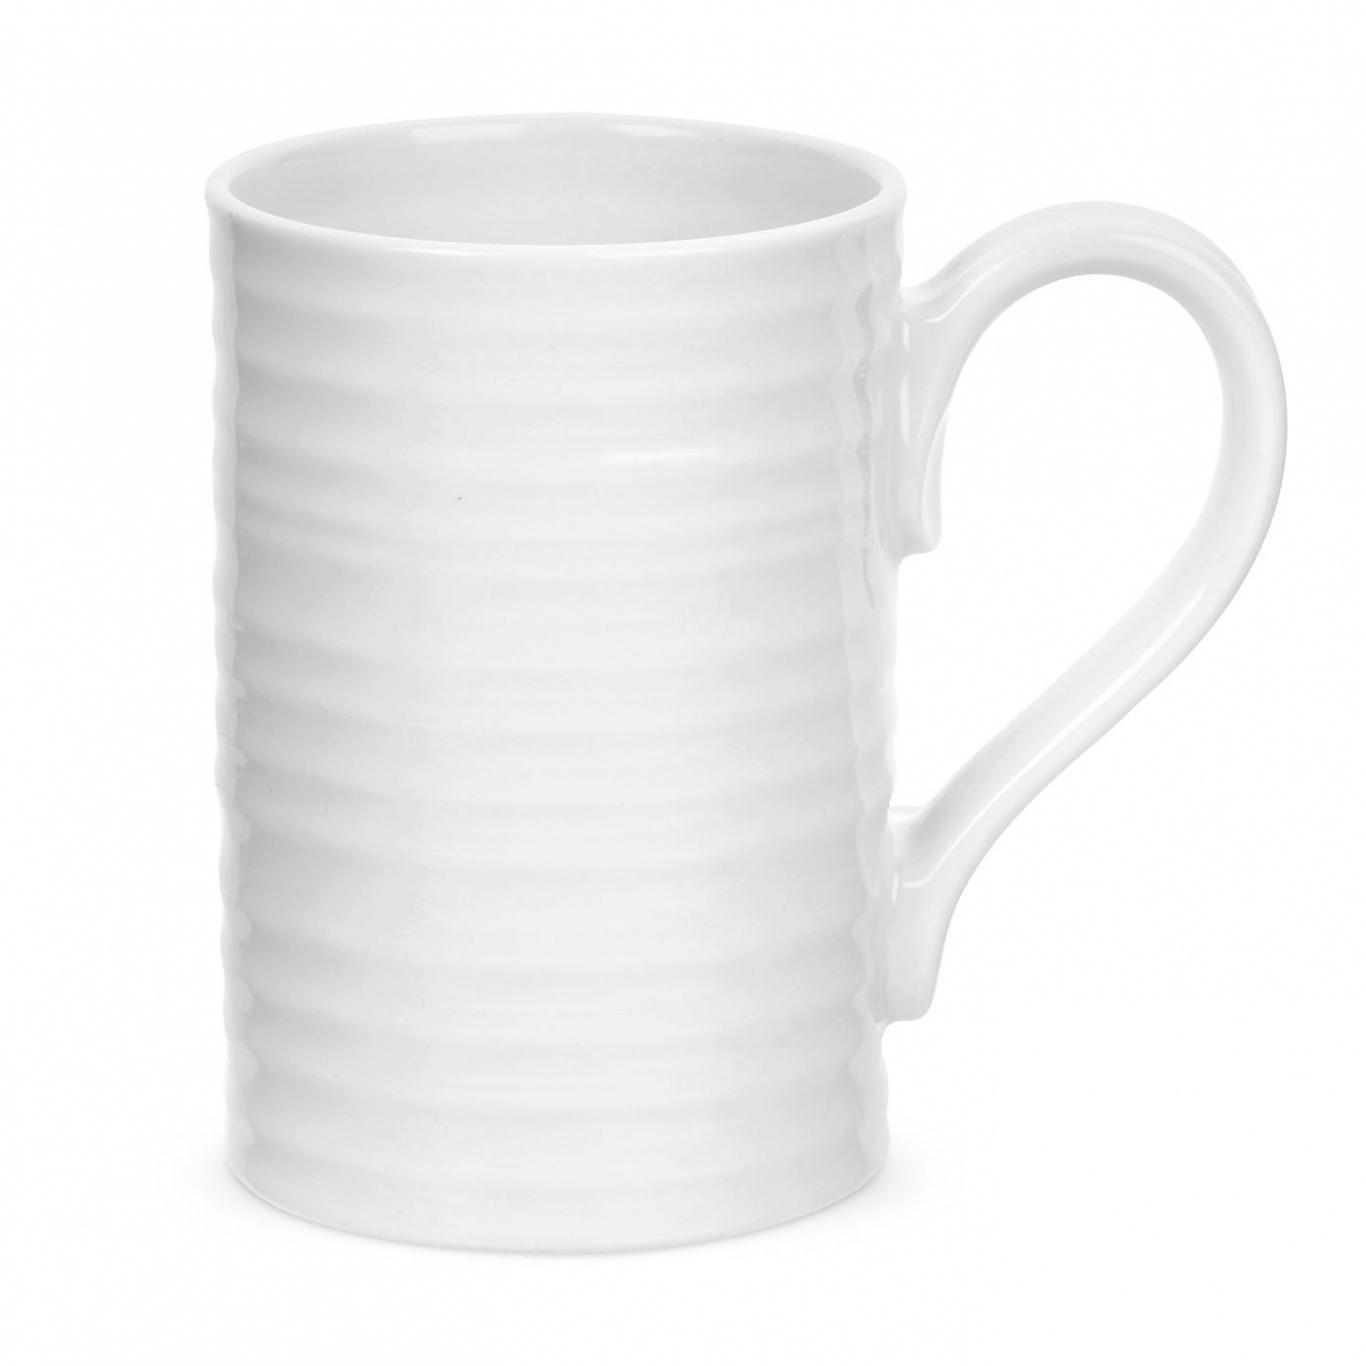 Image of Sophie Conran Tall Mug